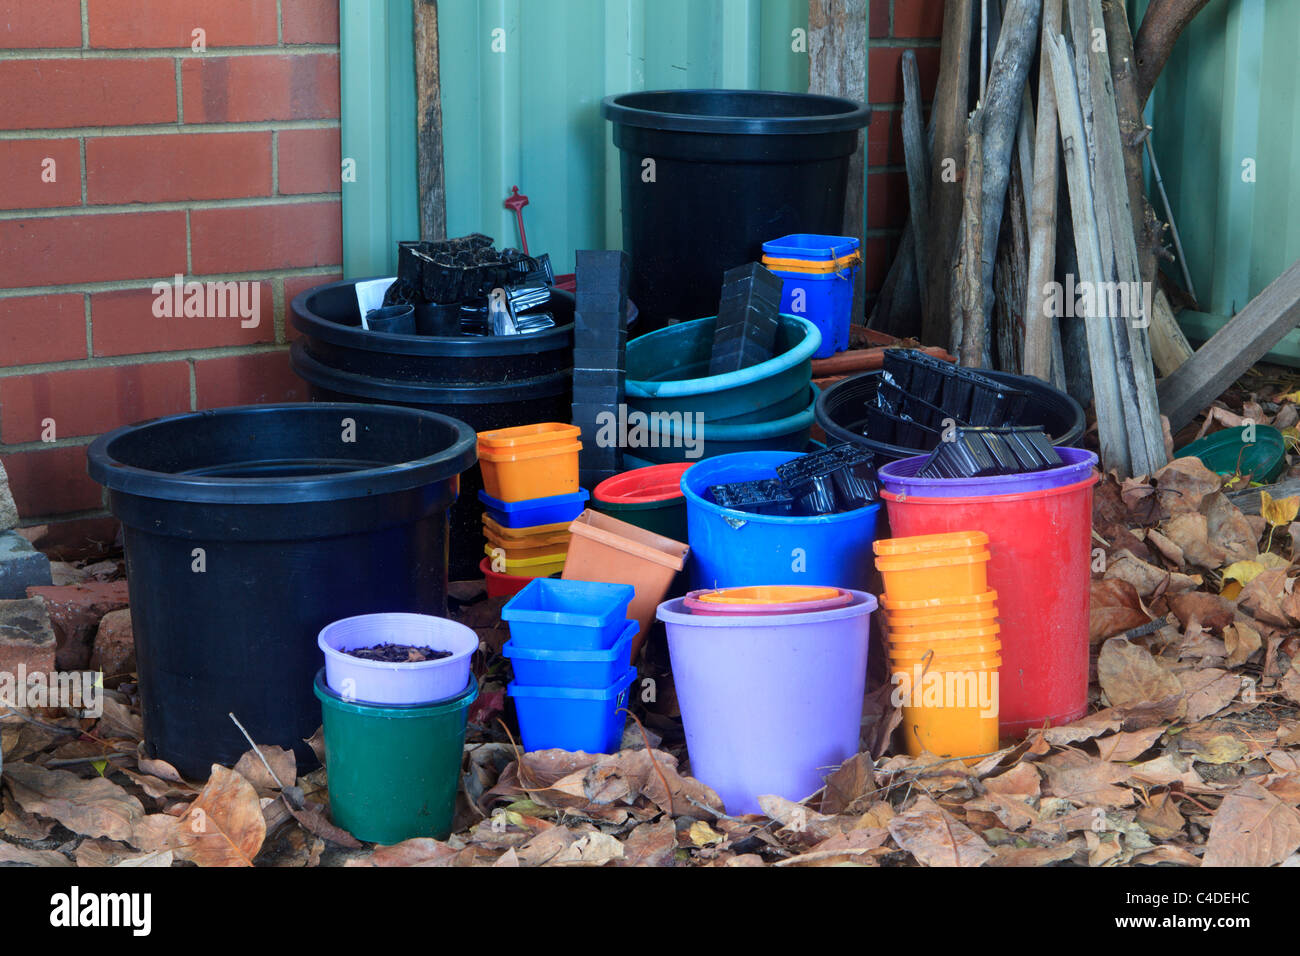 Plastica vasi di piante Immagini Stock